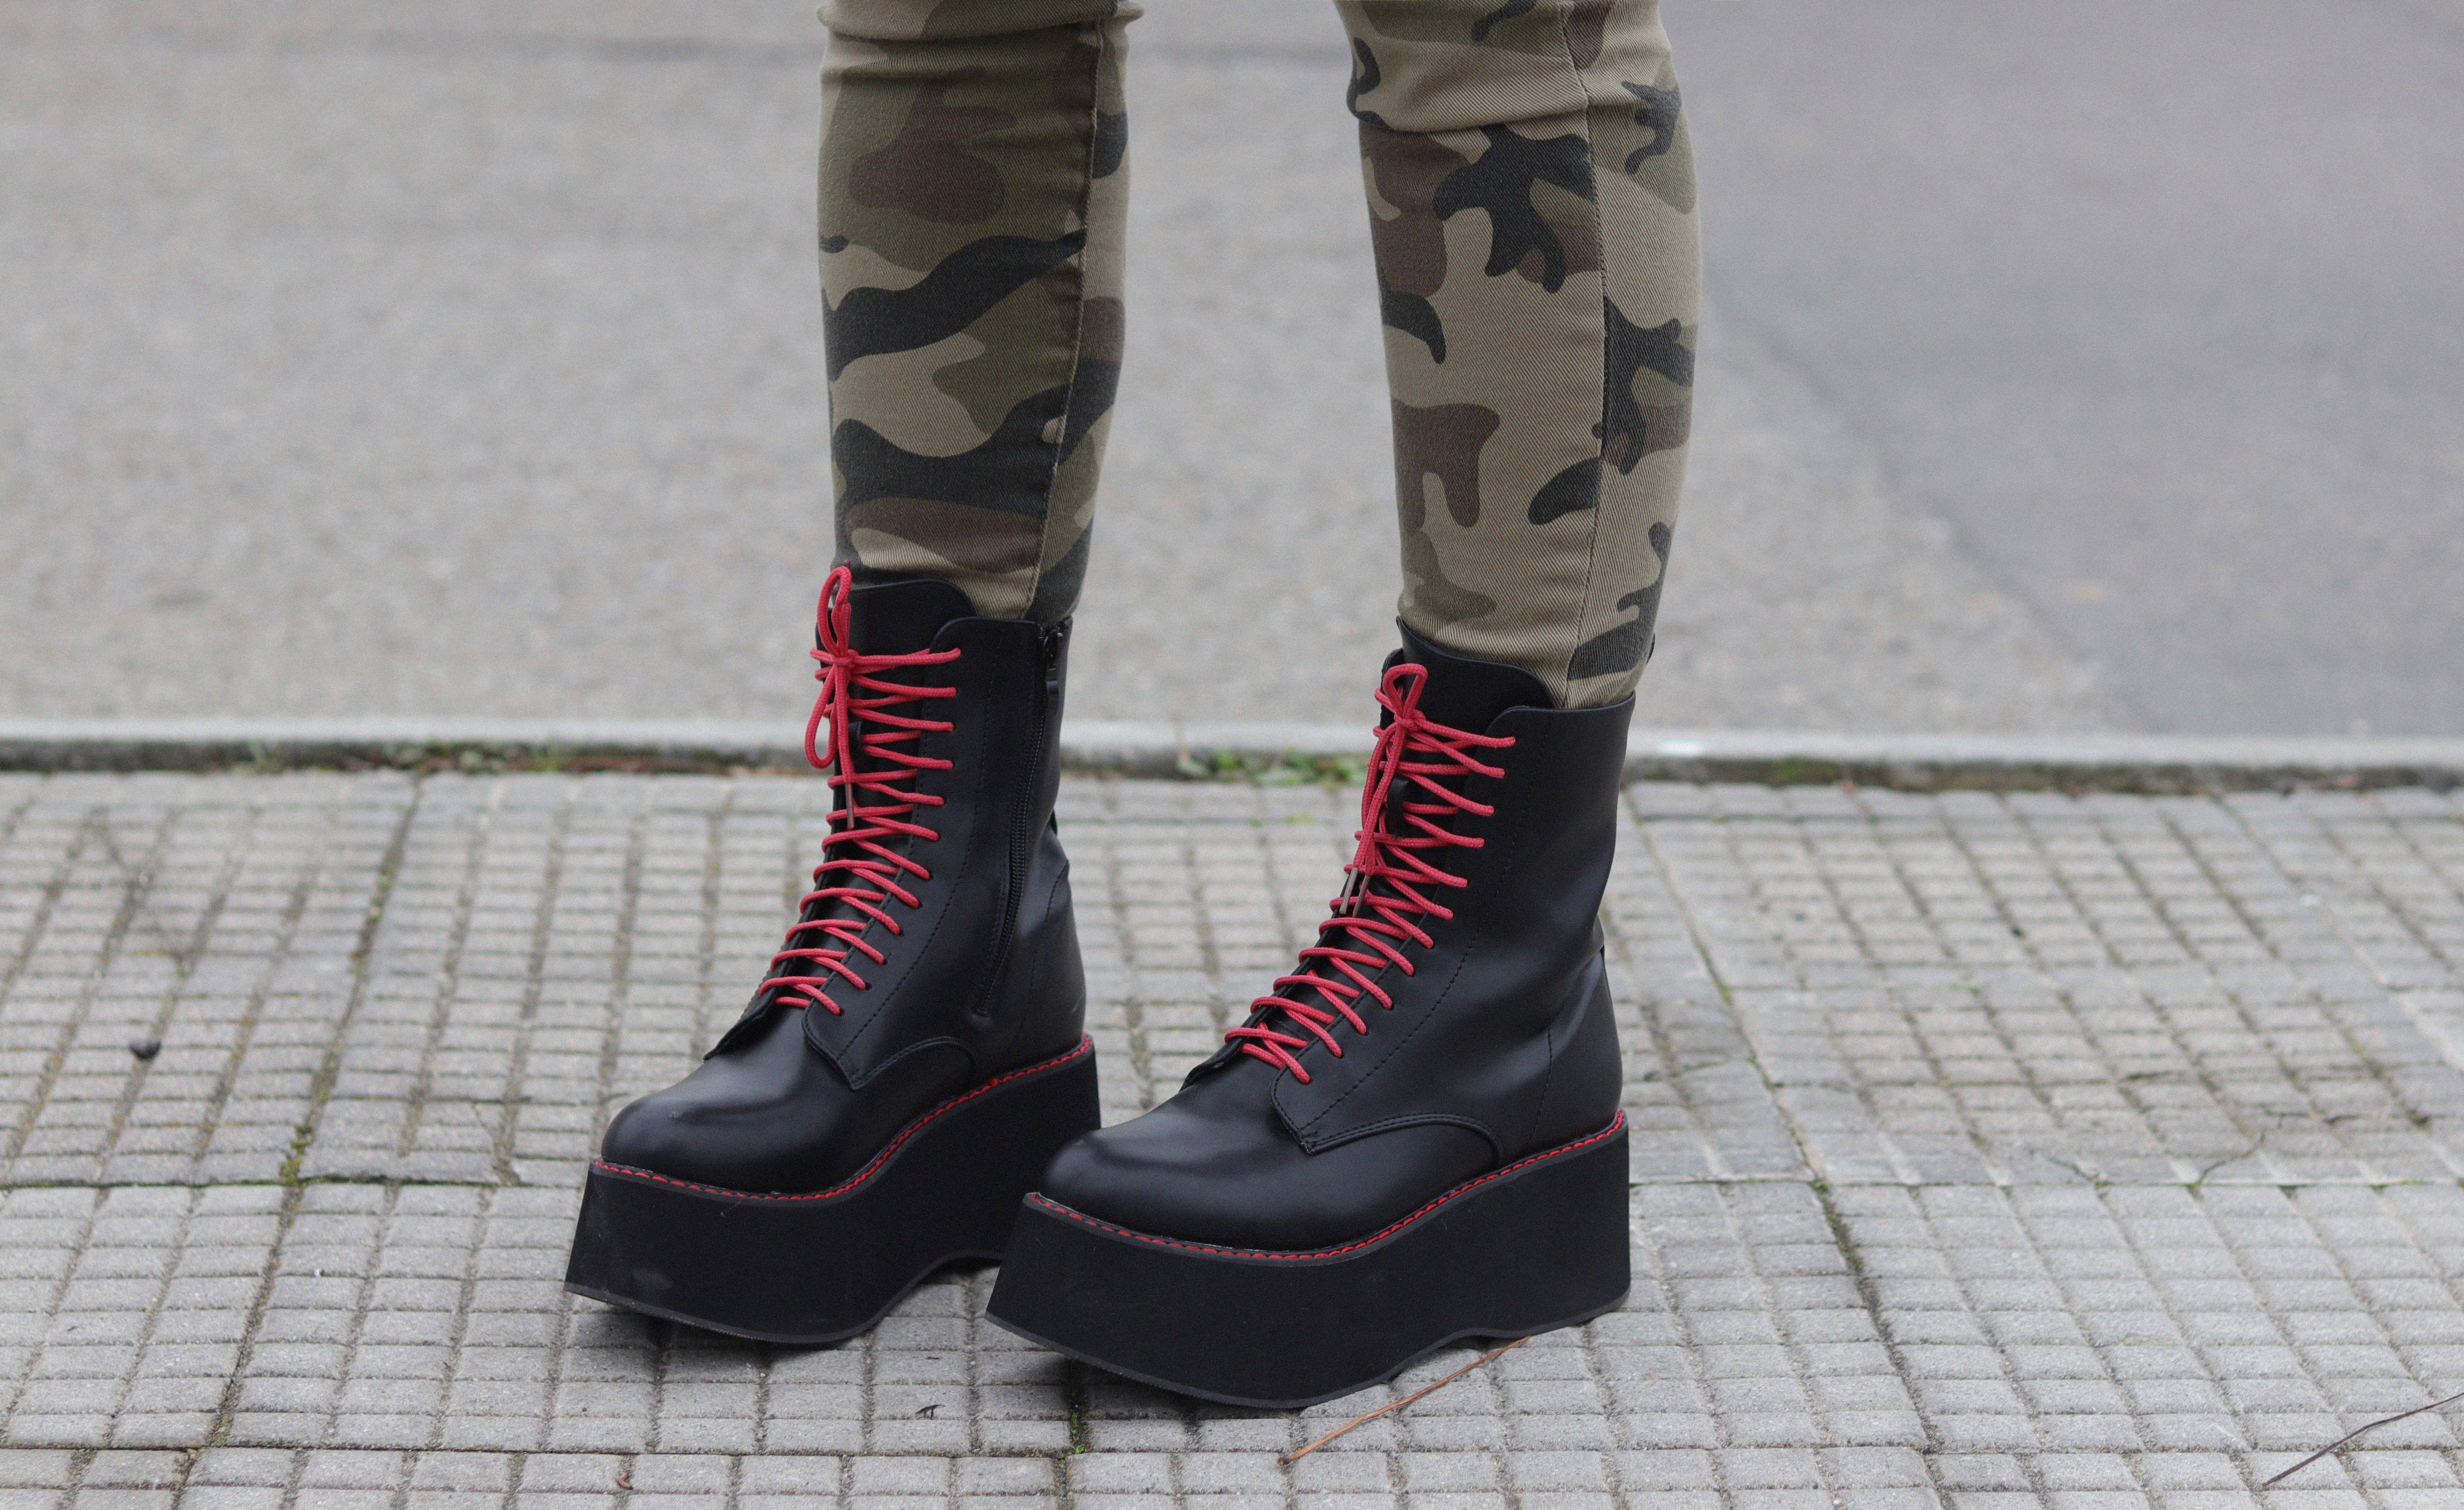 Trendencies Blog | Black combat boots